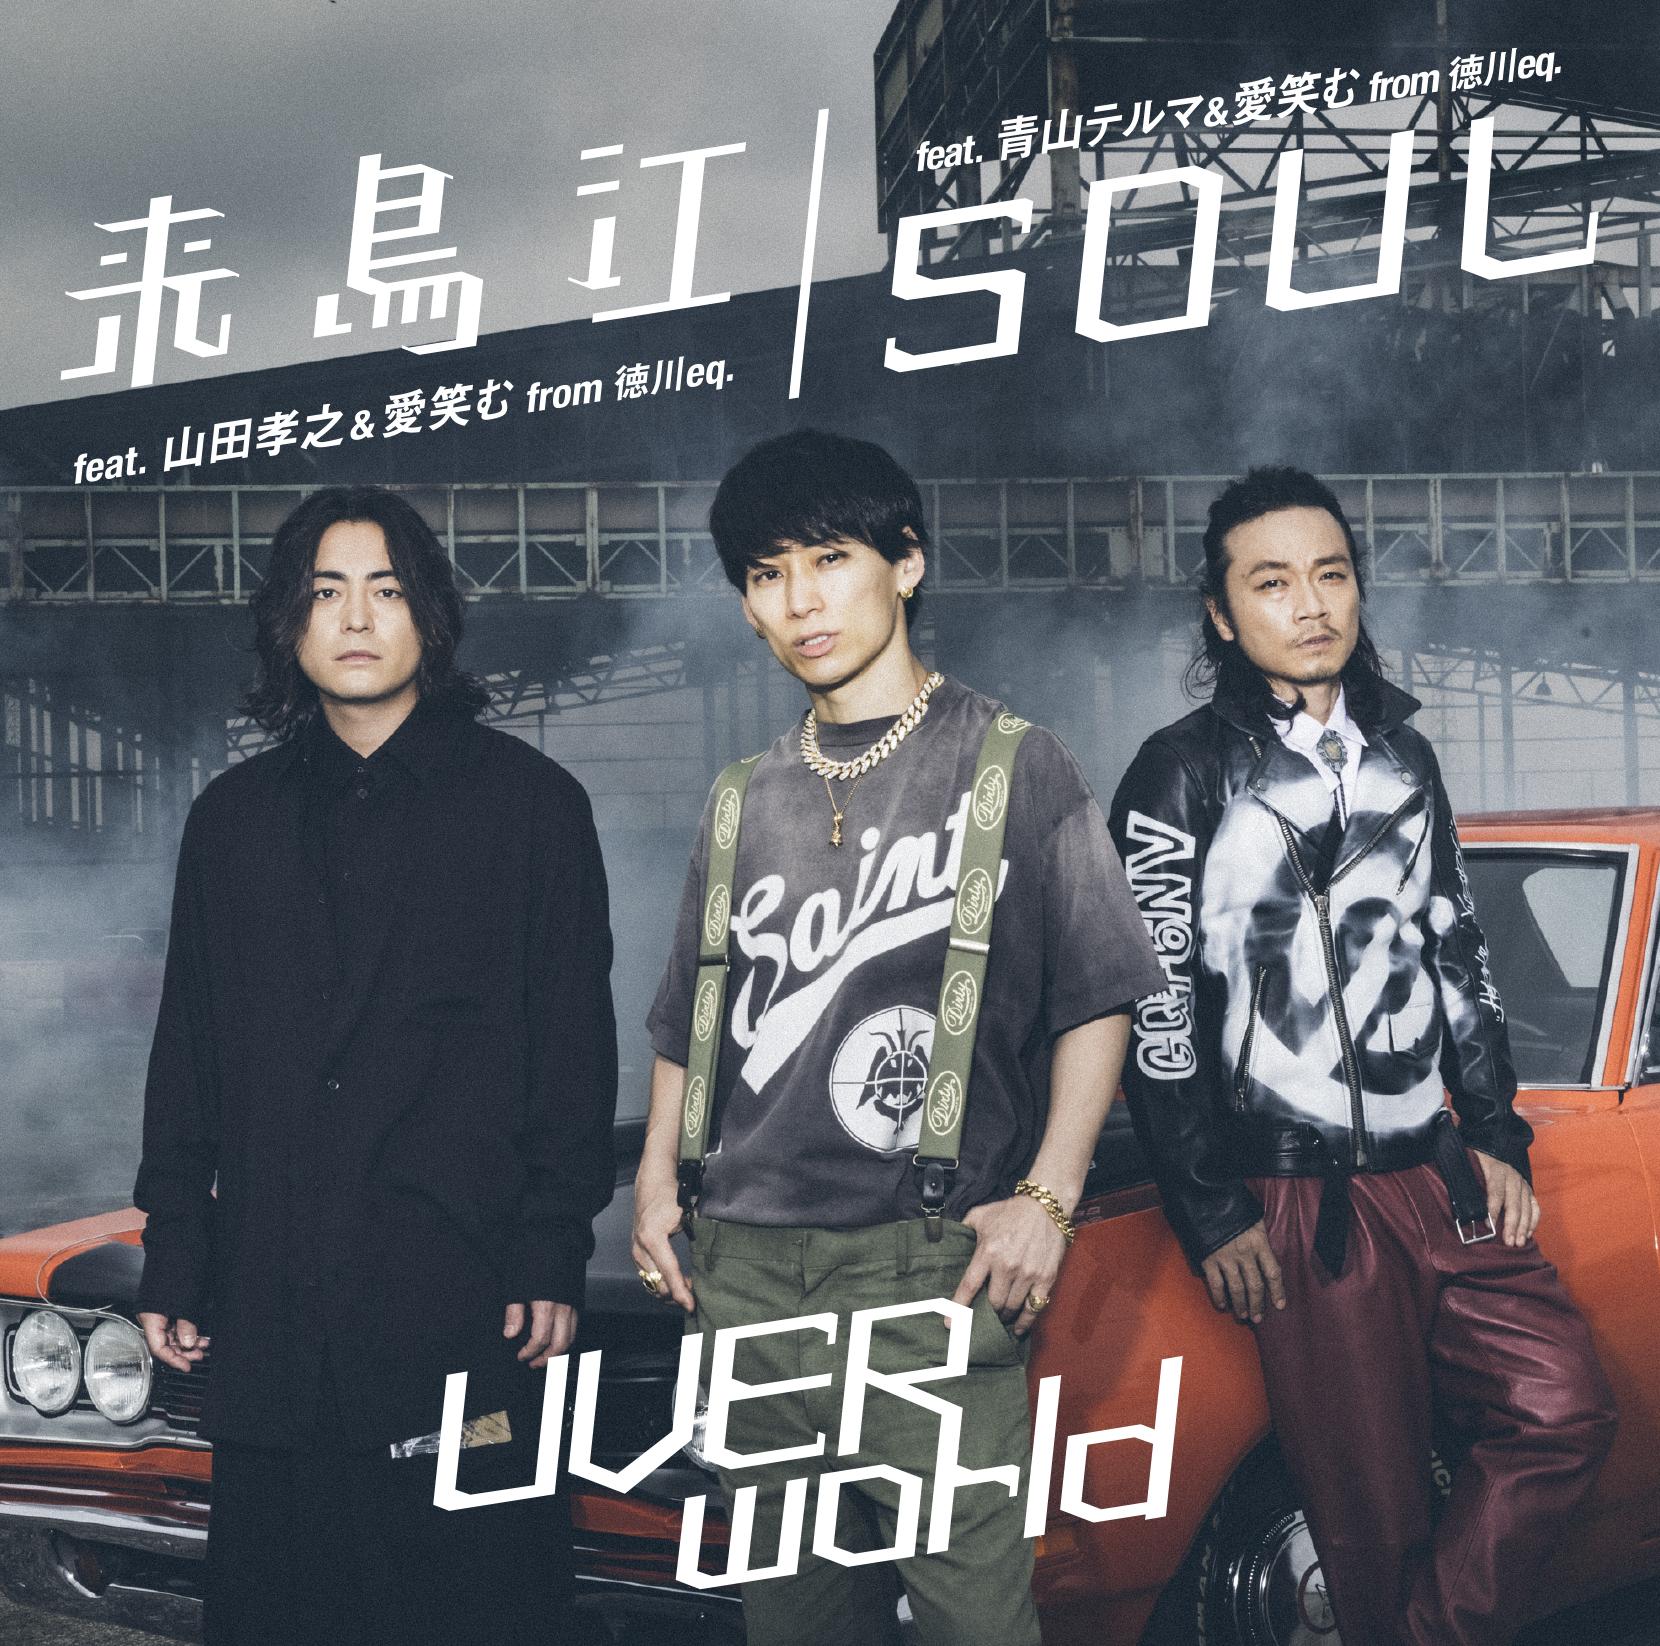 UVERworld feat. 山田孝之, 愛笑む - 「来鳥江」